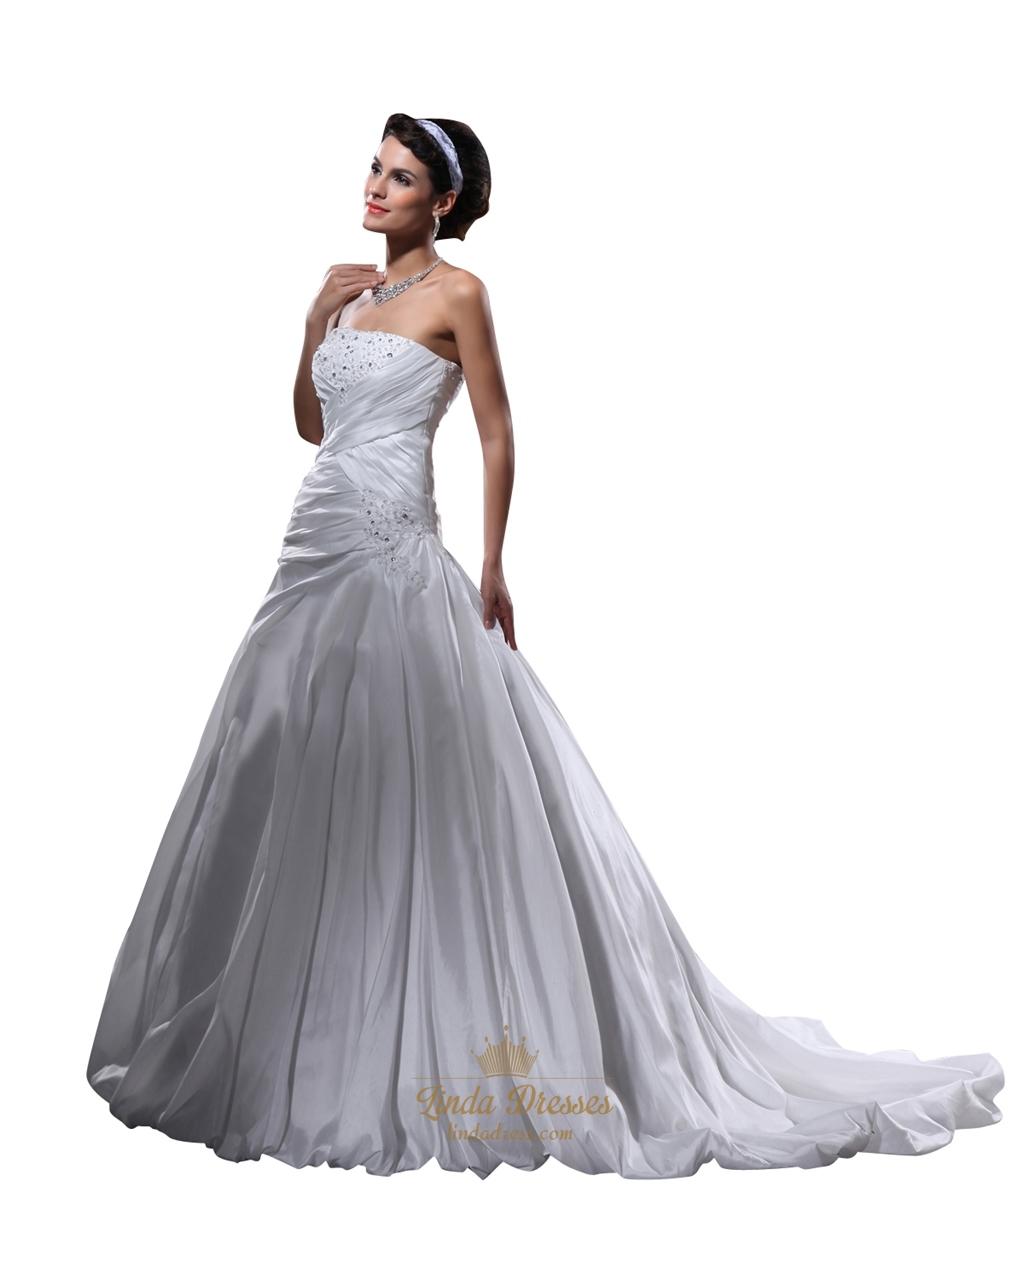 Ivory Taffeta Dress